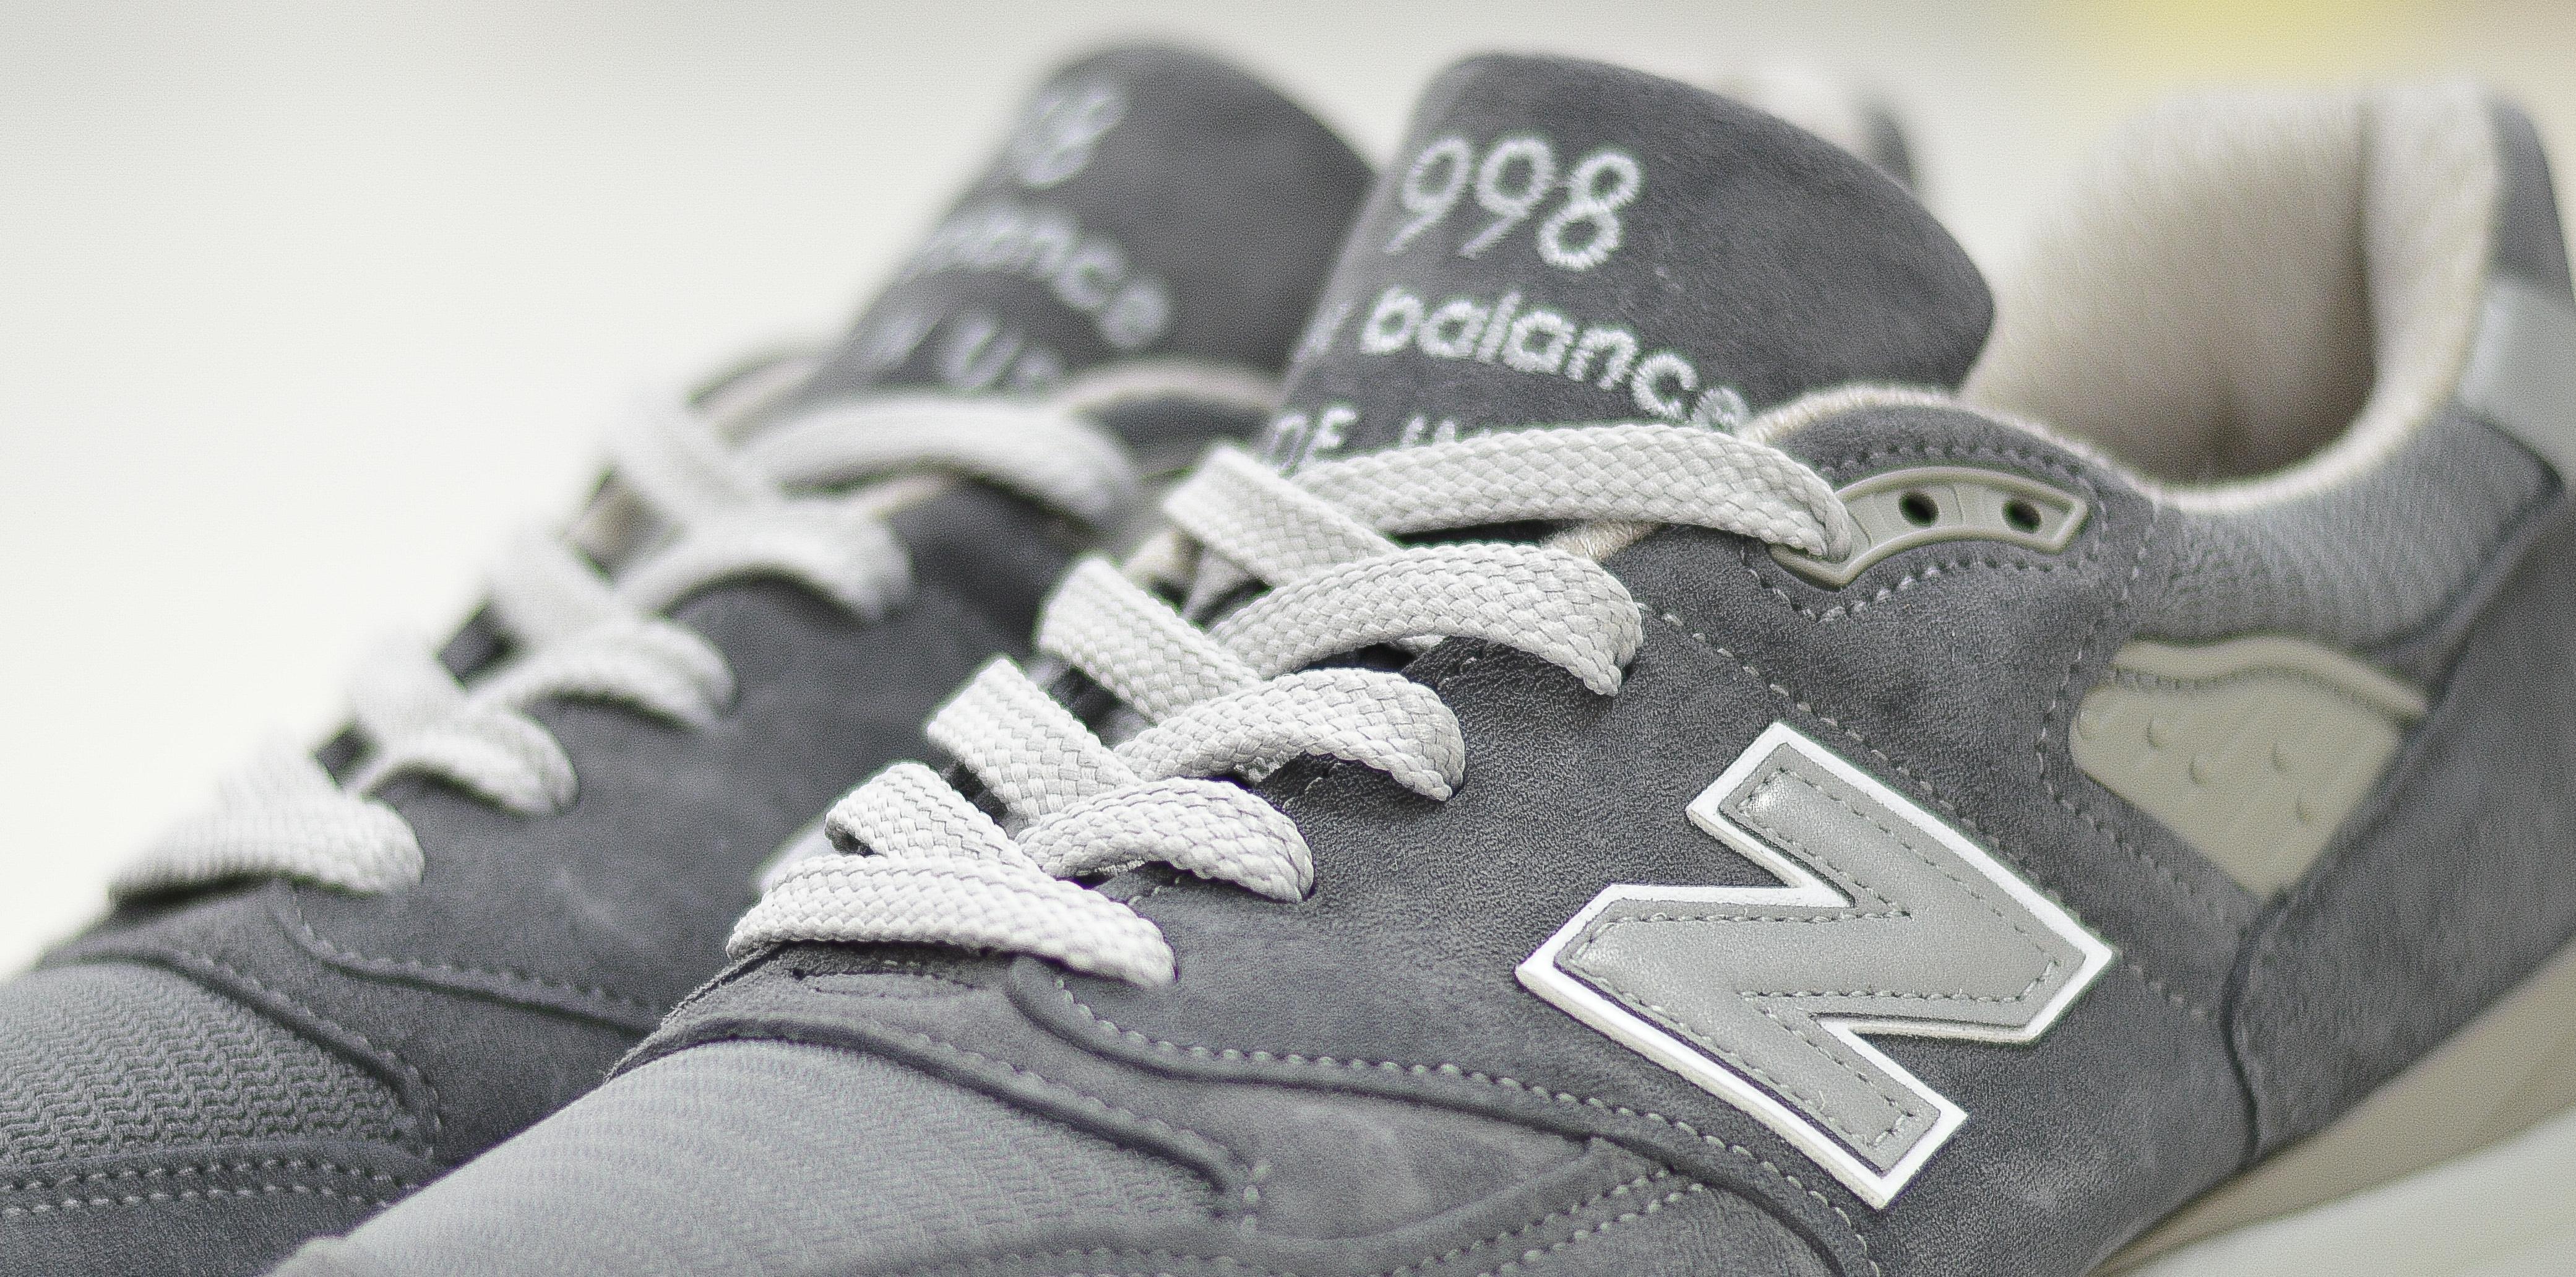 New Balance 998 Piedi Di Larghezza HpzKkb